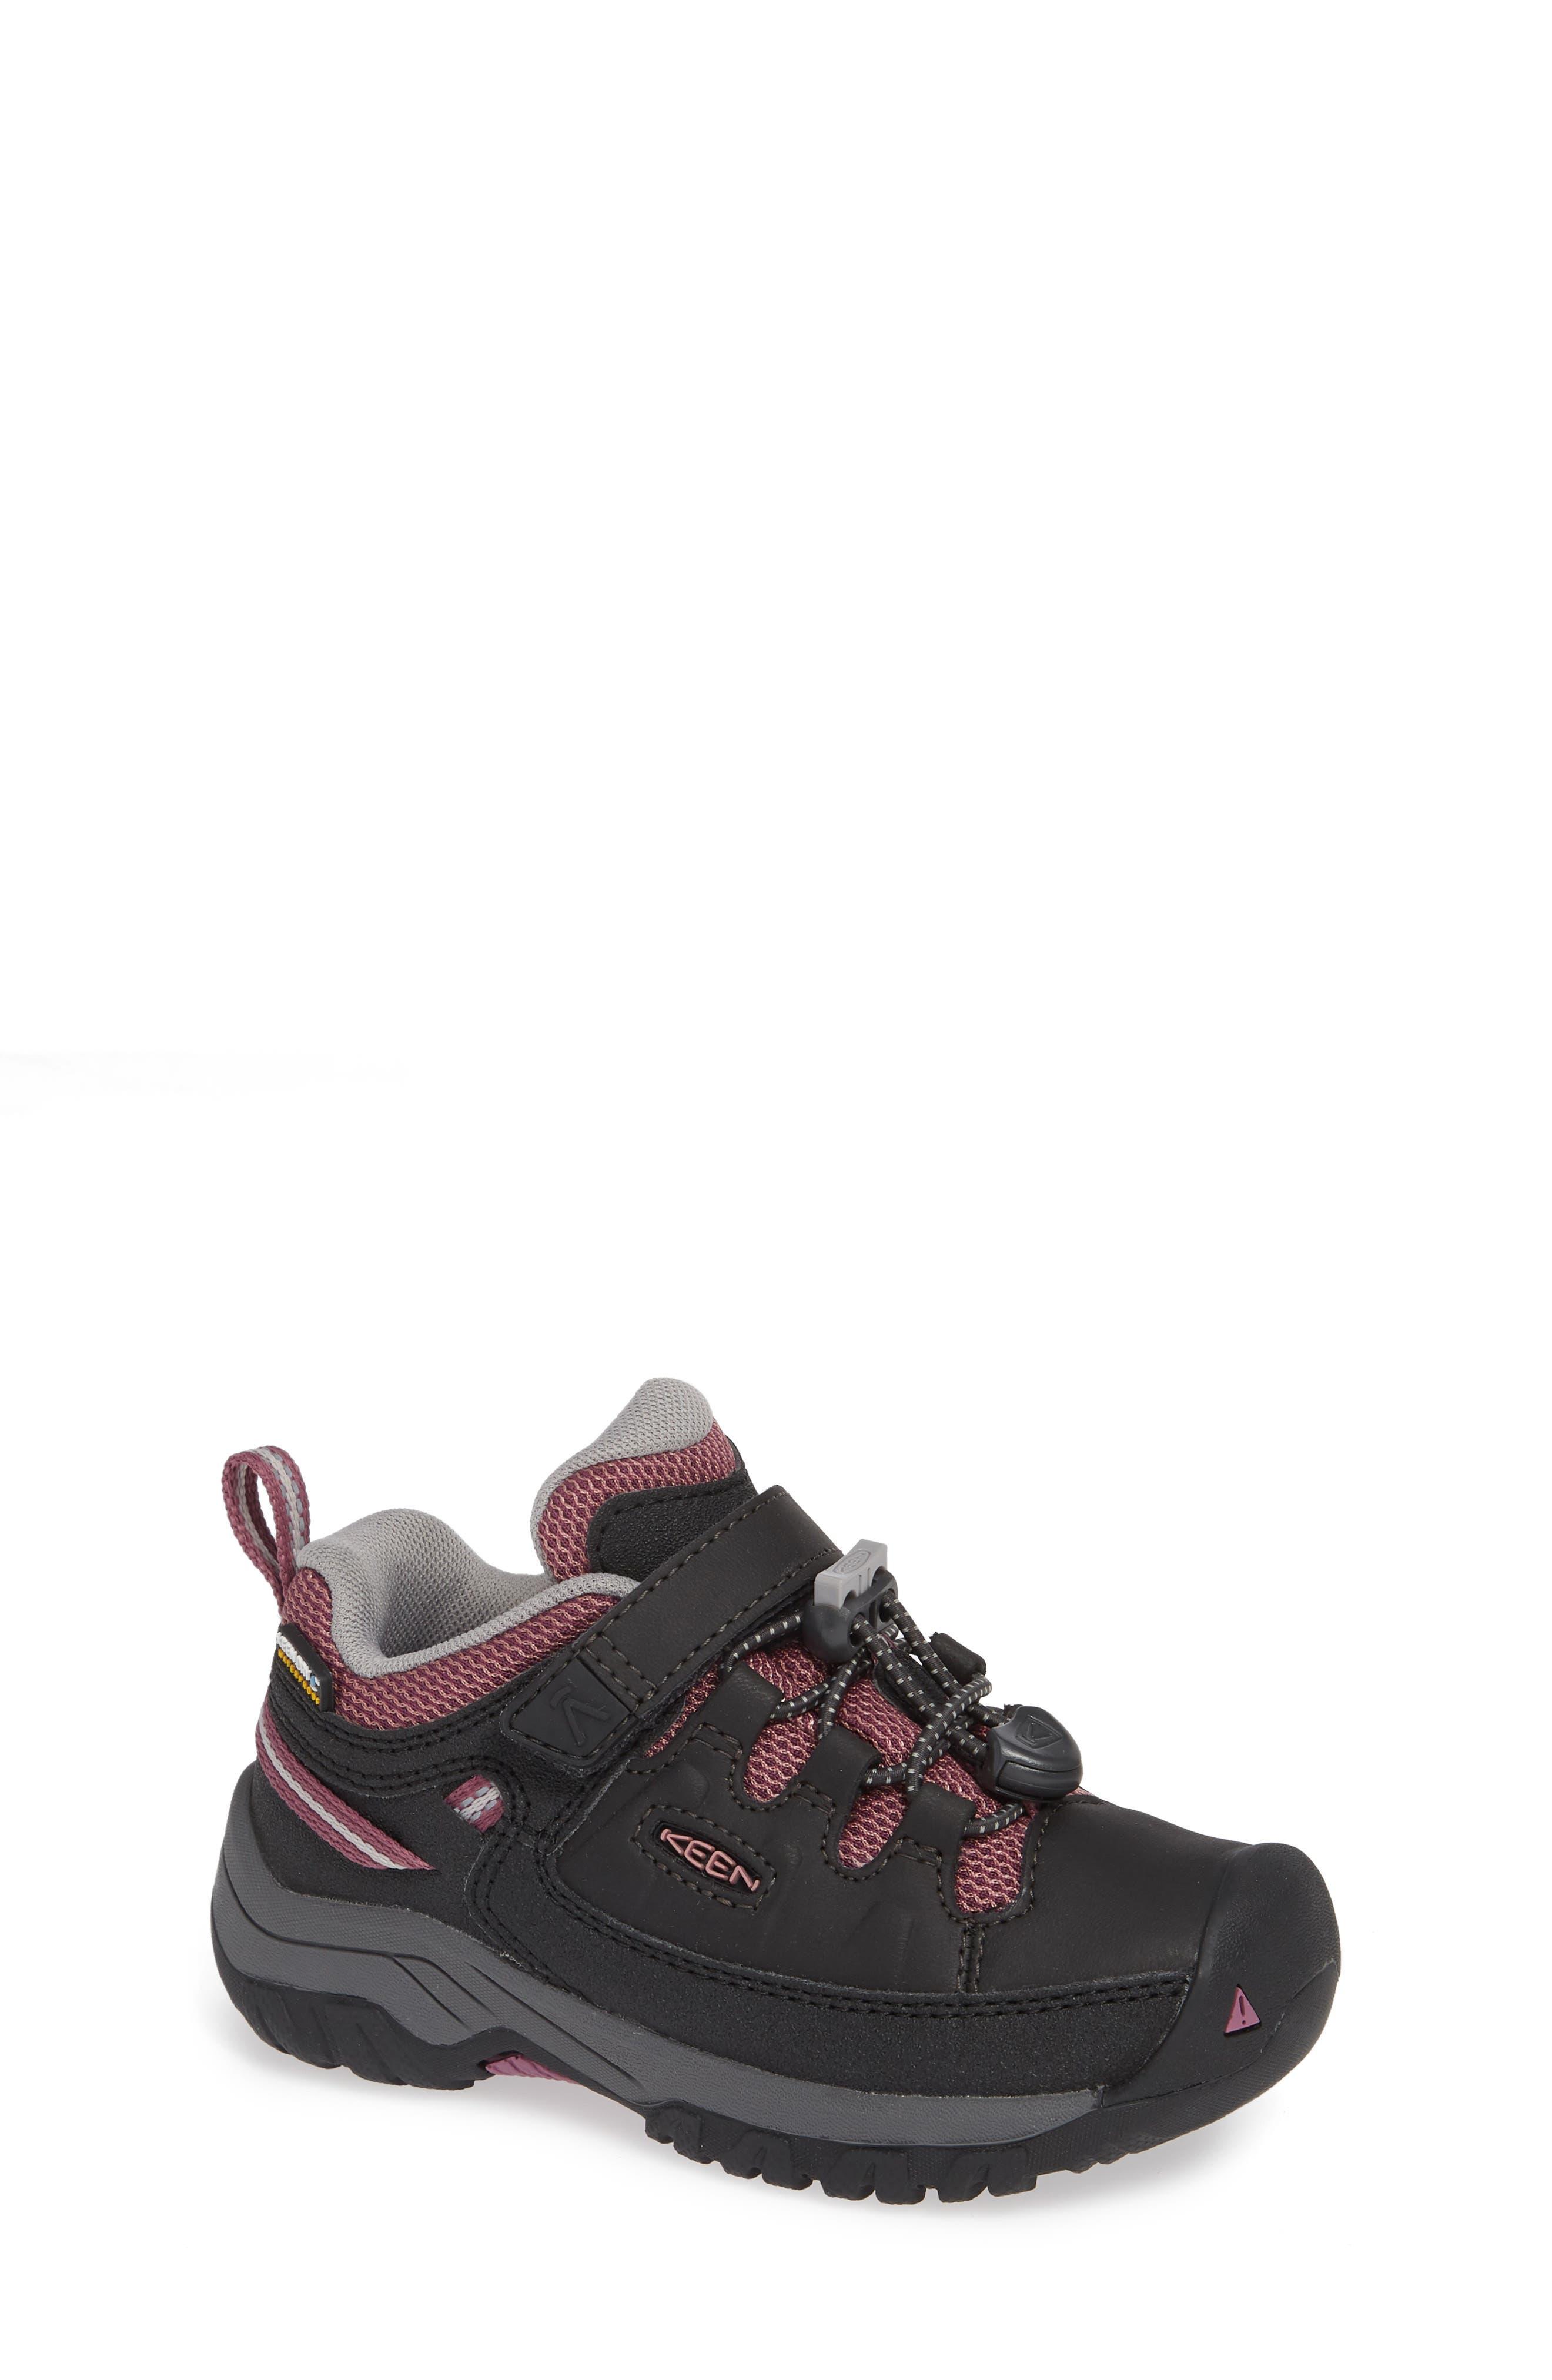 KEEN, Targhee Low Waterproof Sneaker, Main thumbnail 1, color, RAVEN/ TULIPWOOD